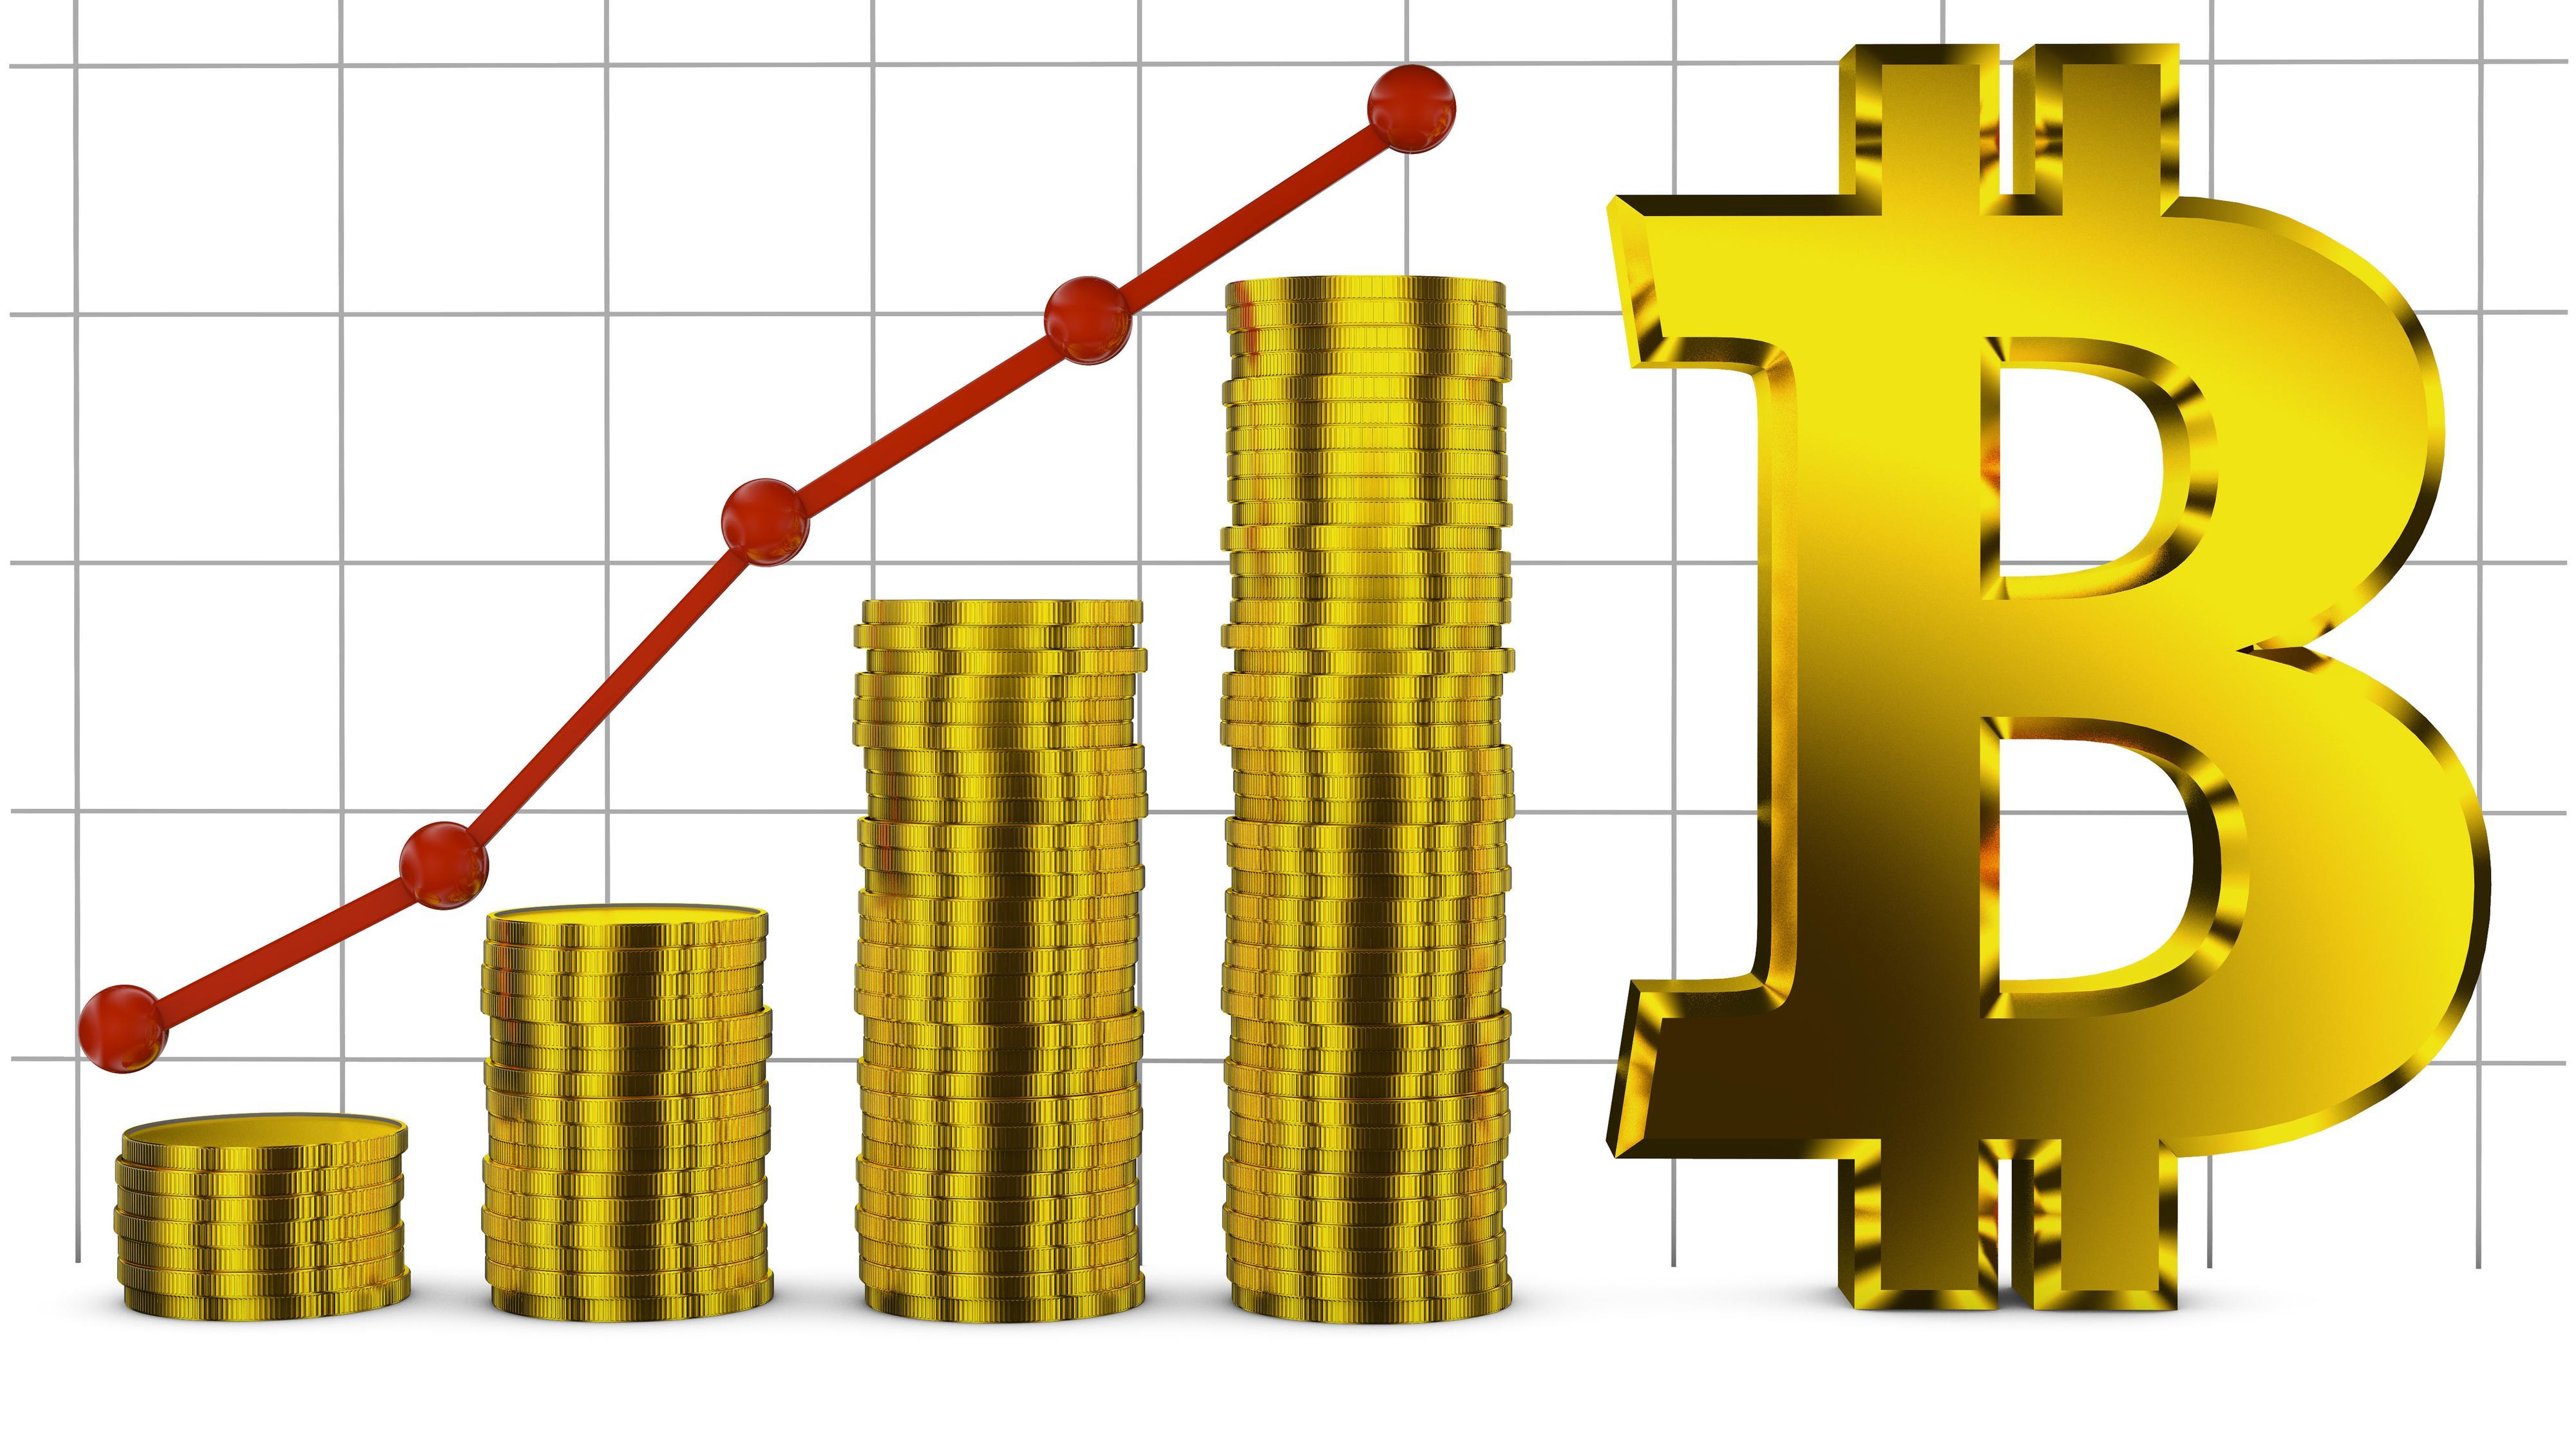 Én Bitcoin er nå verdt over 2000 dollar